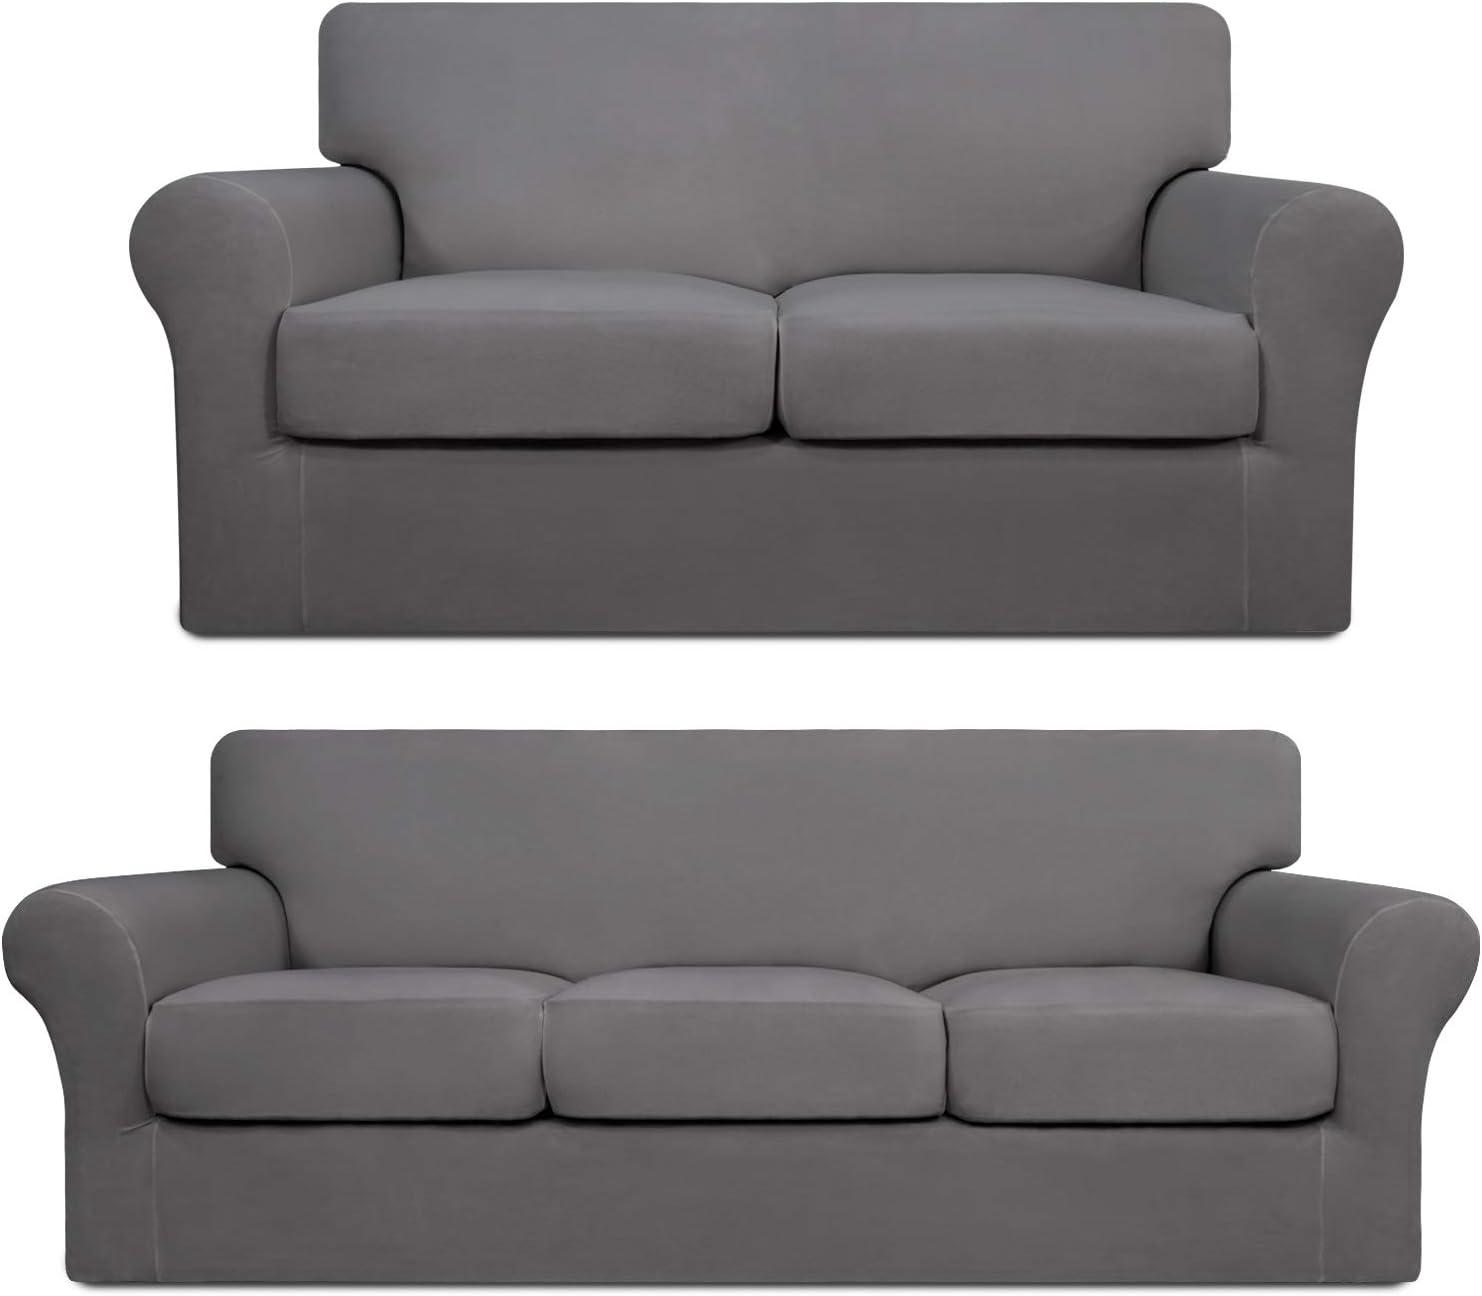 Easy-Going Loveseat slipcover アウトレット☆送料無料 Bundles 格安 価格でご提供いたします Sofa